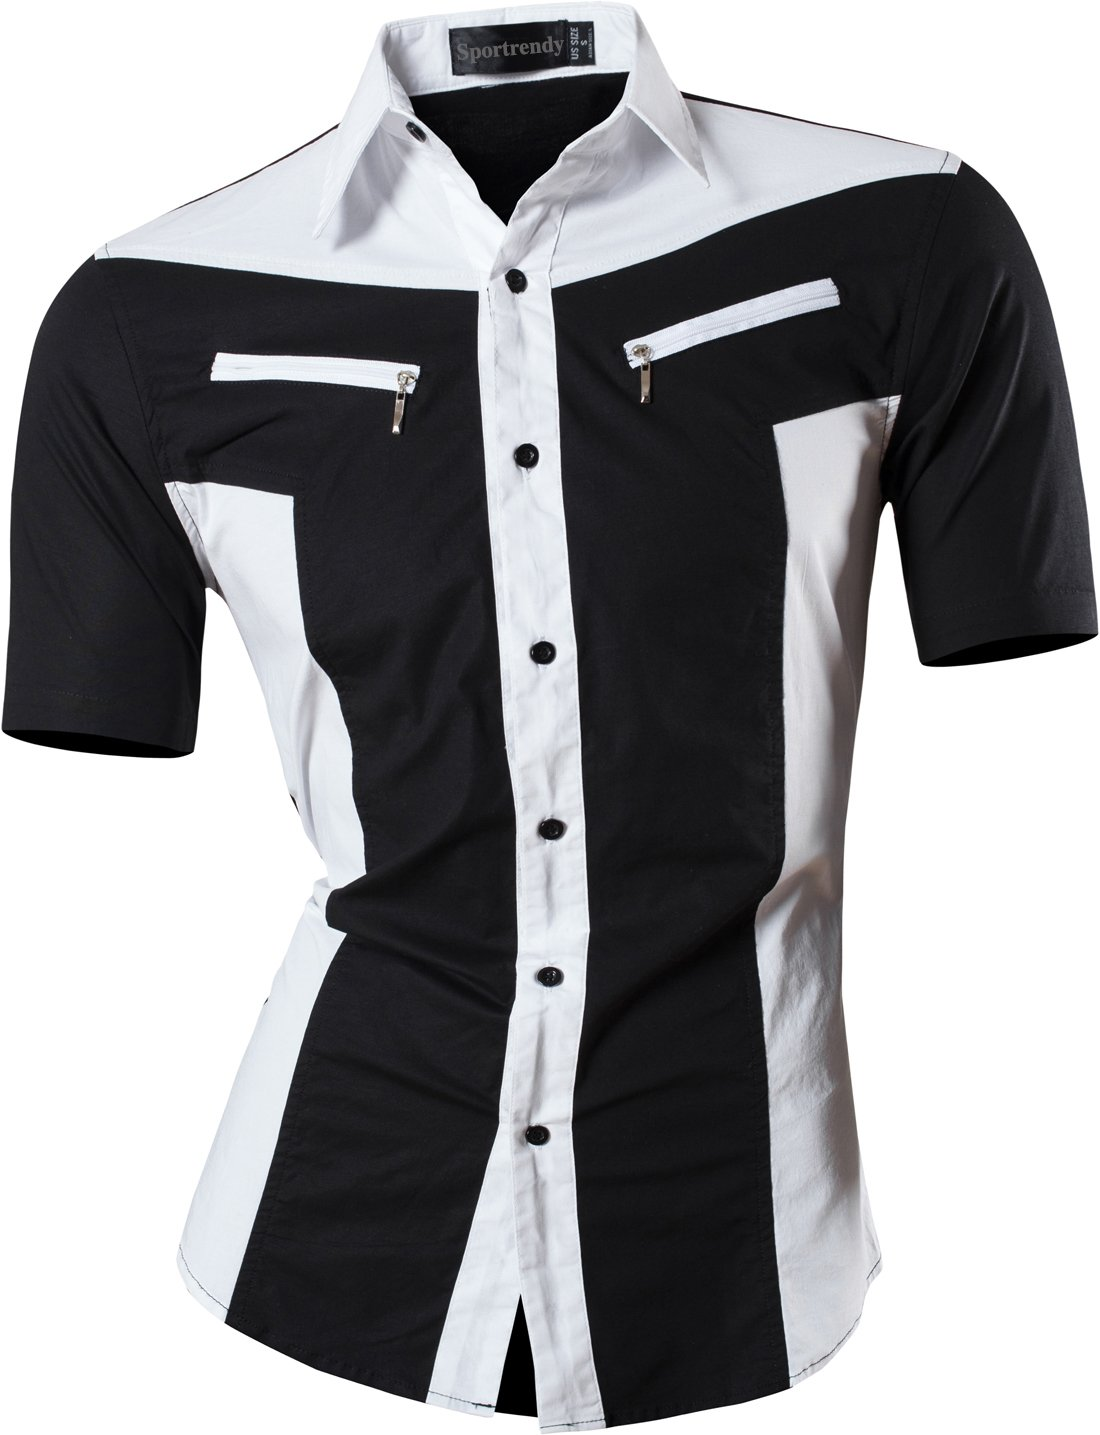 Sportrendy Men's Slim Short Sleeve Casual Button Down Dress Shirt JZS062 Black M